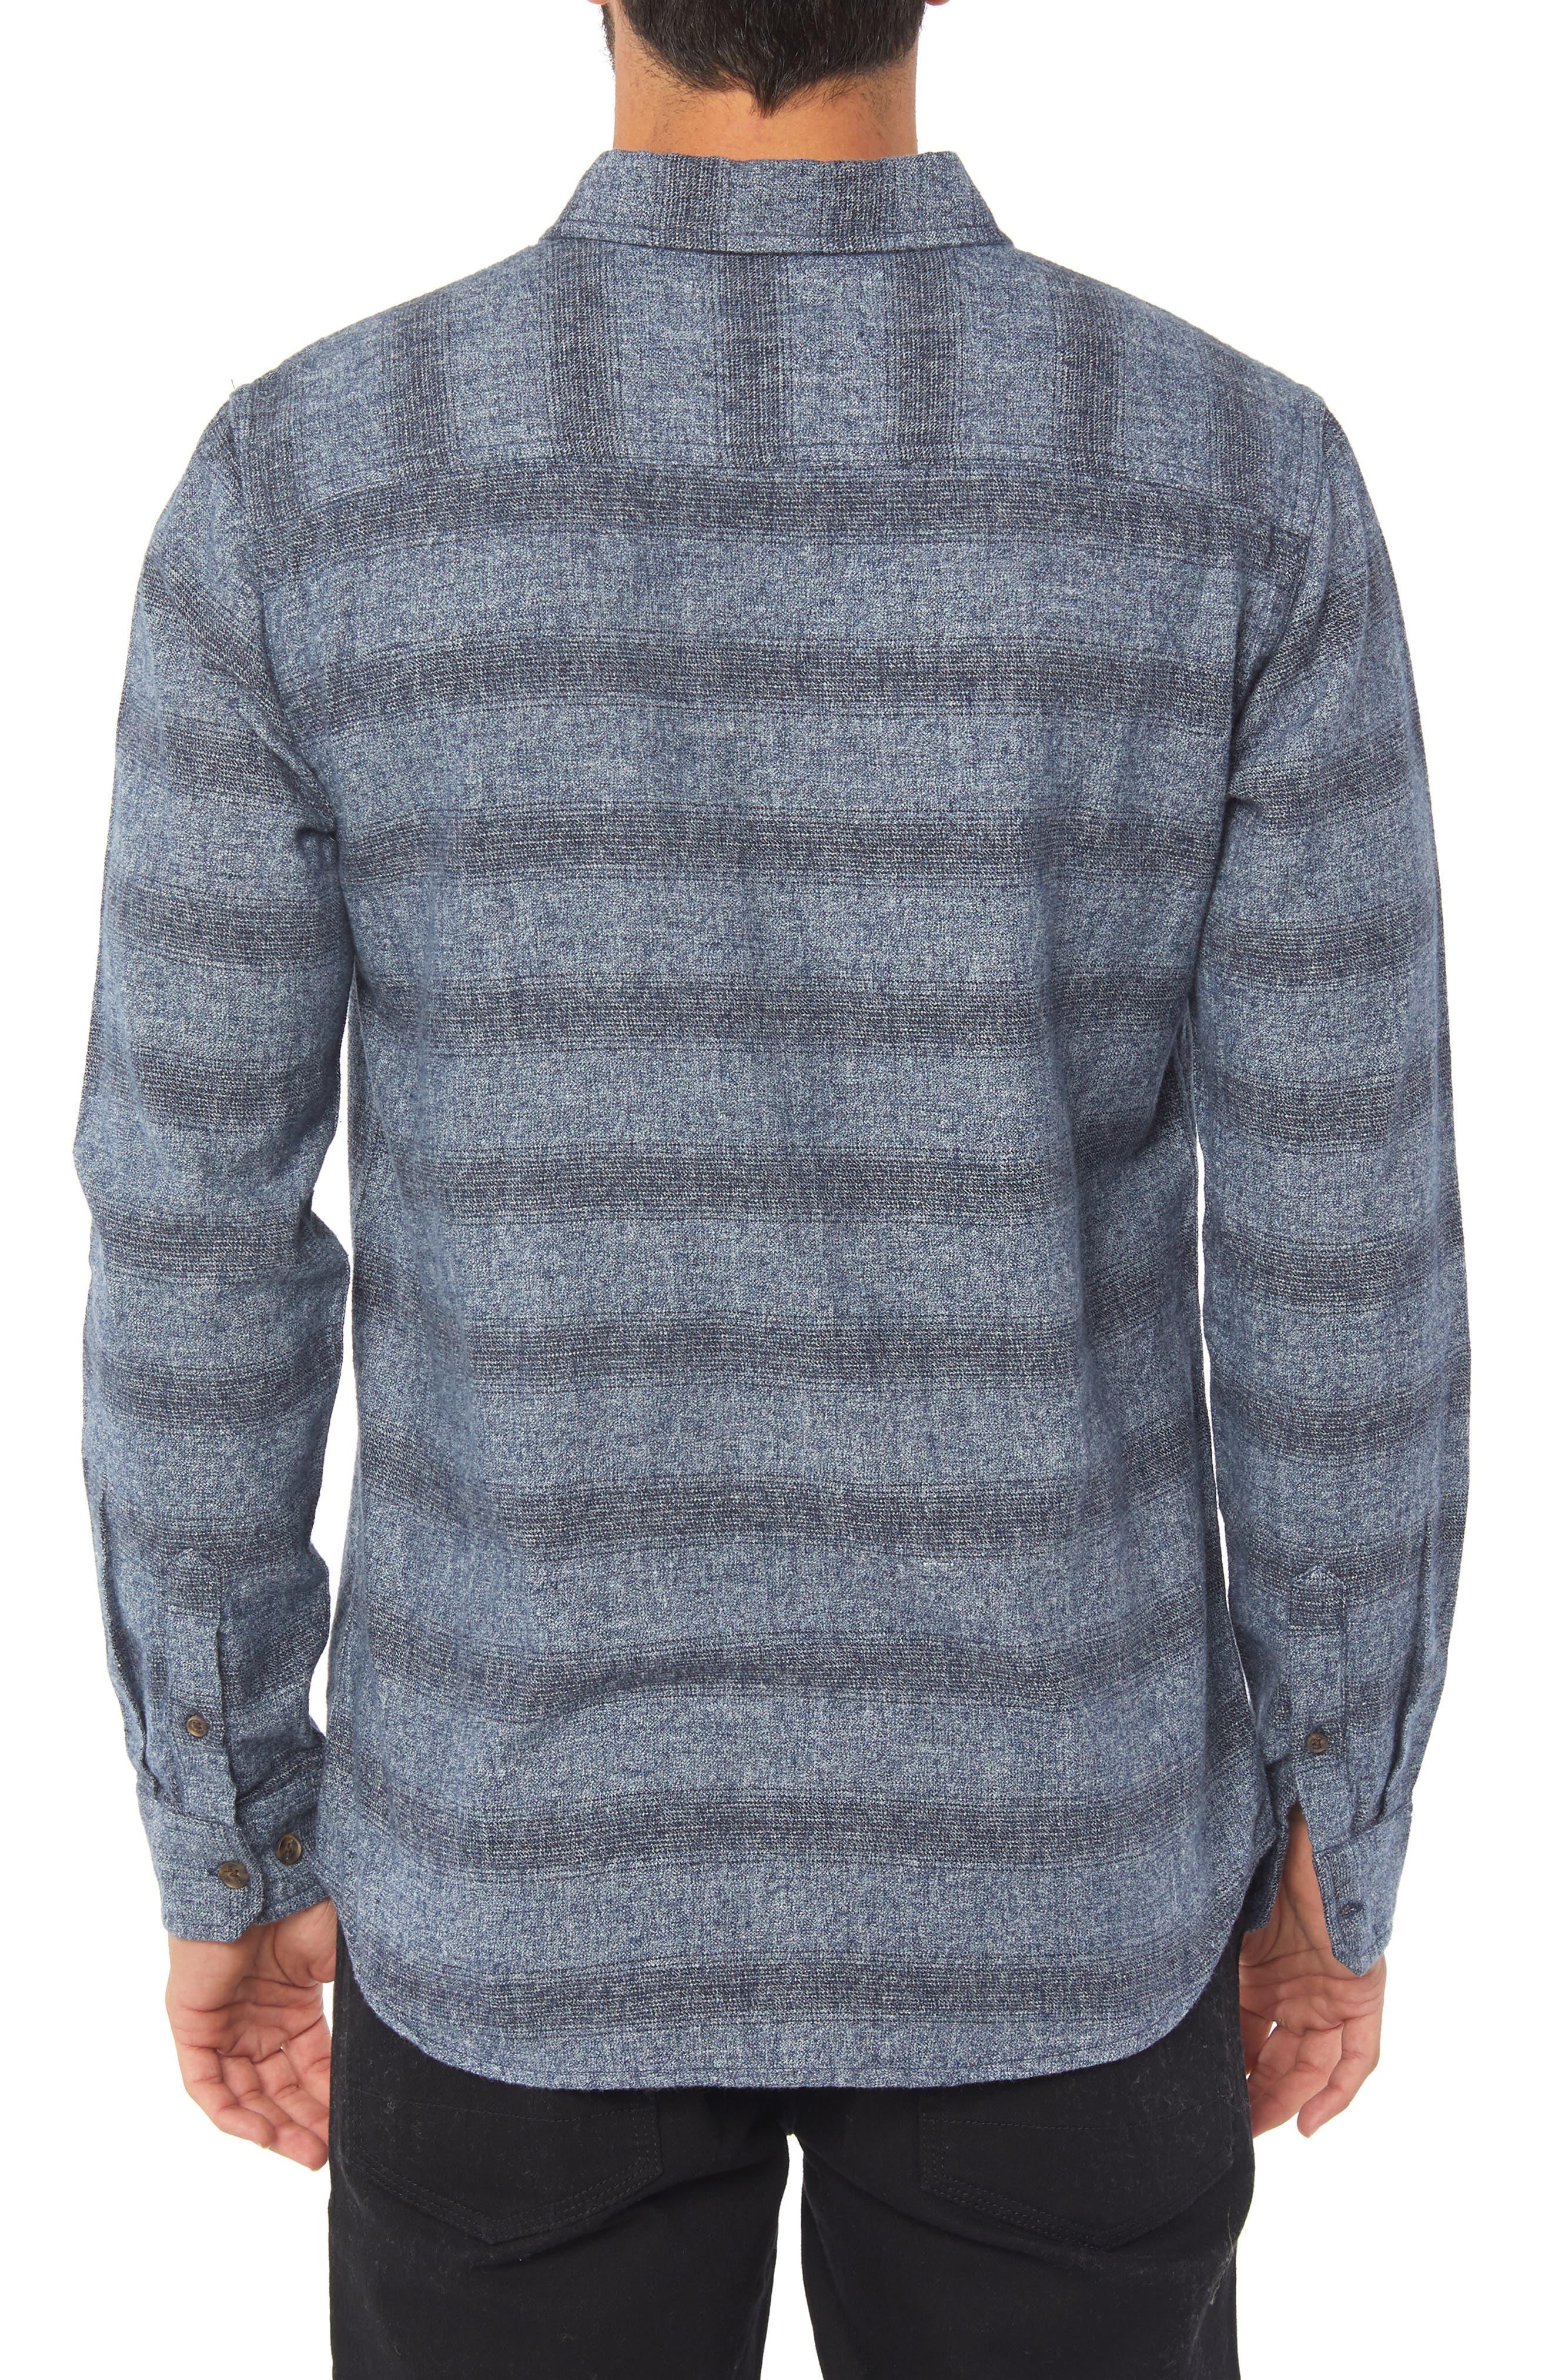 O'NEILL,                             Covington Flannel Shirt,                             Alternate thumbnail 2, color,                             410